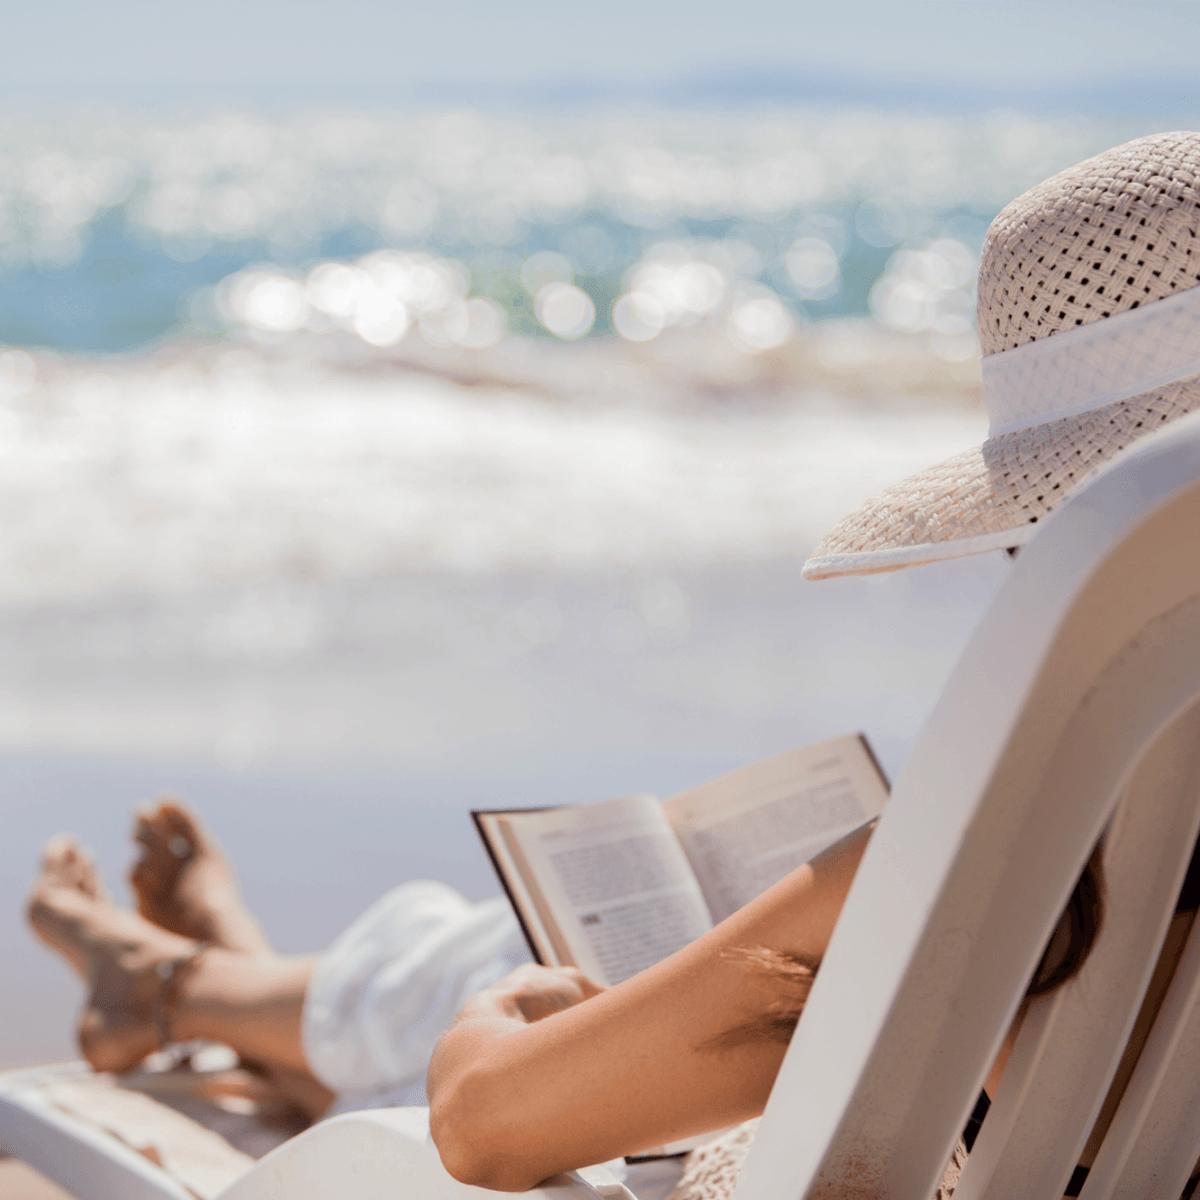 Best Travel Memoirs to Inspire Wanderlust